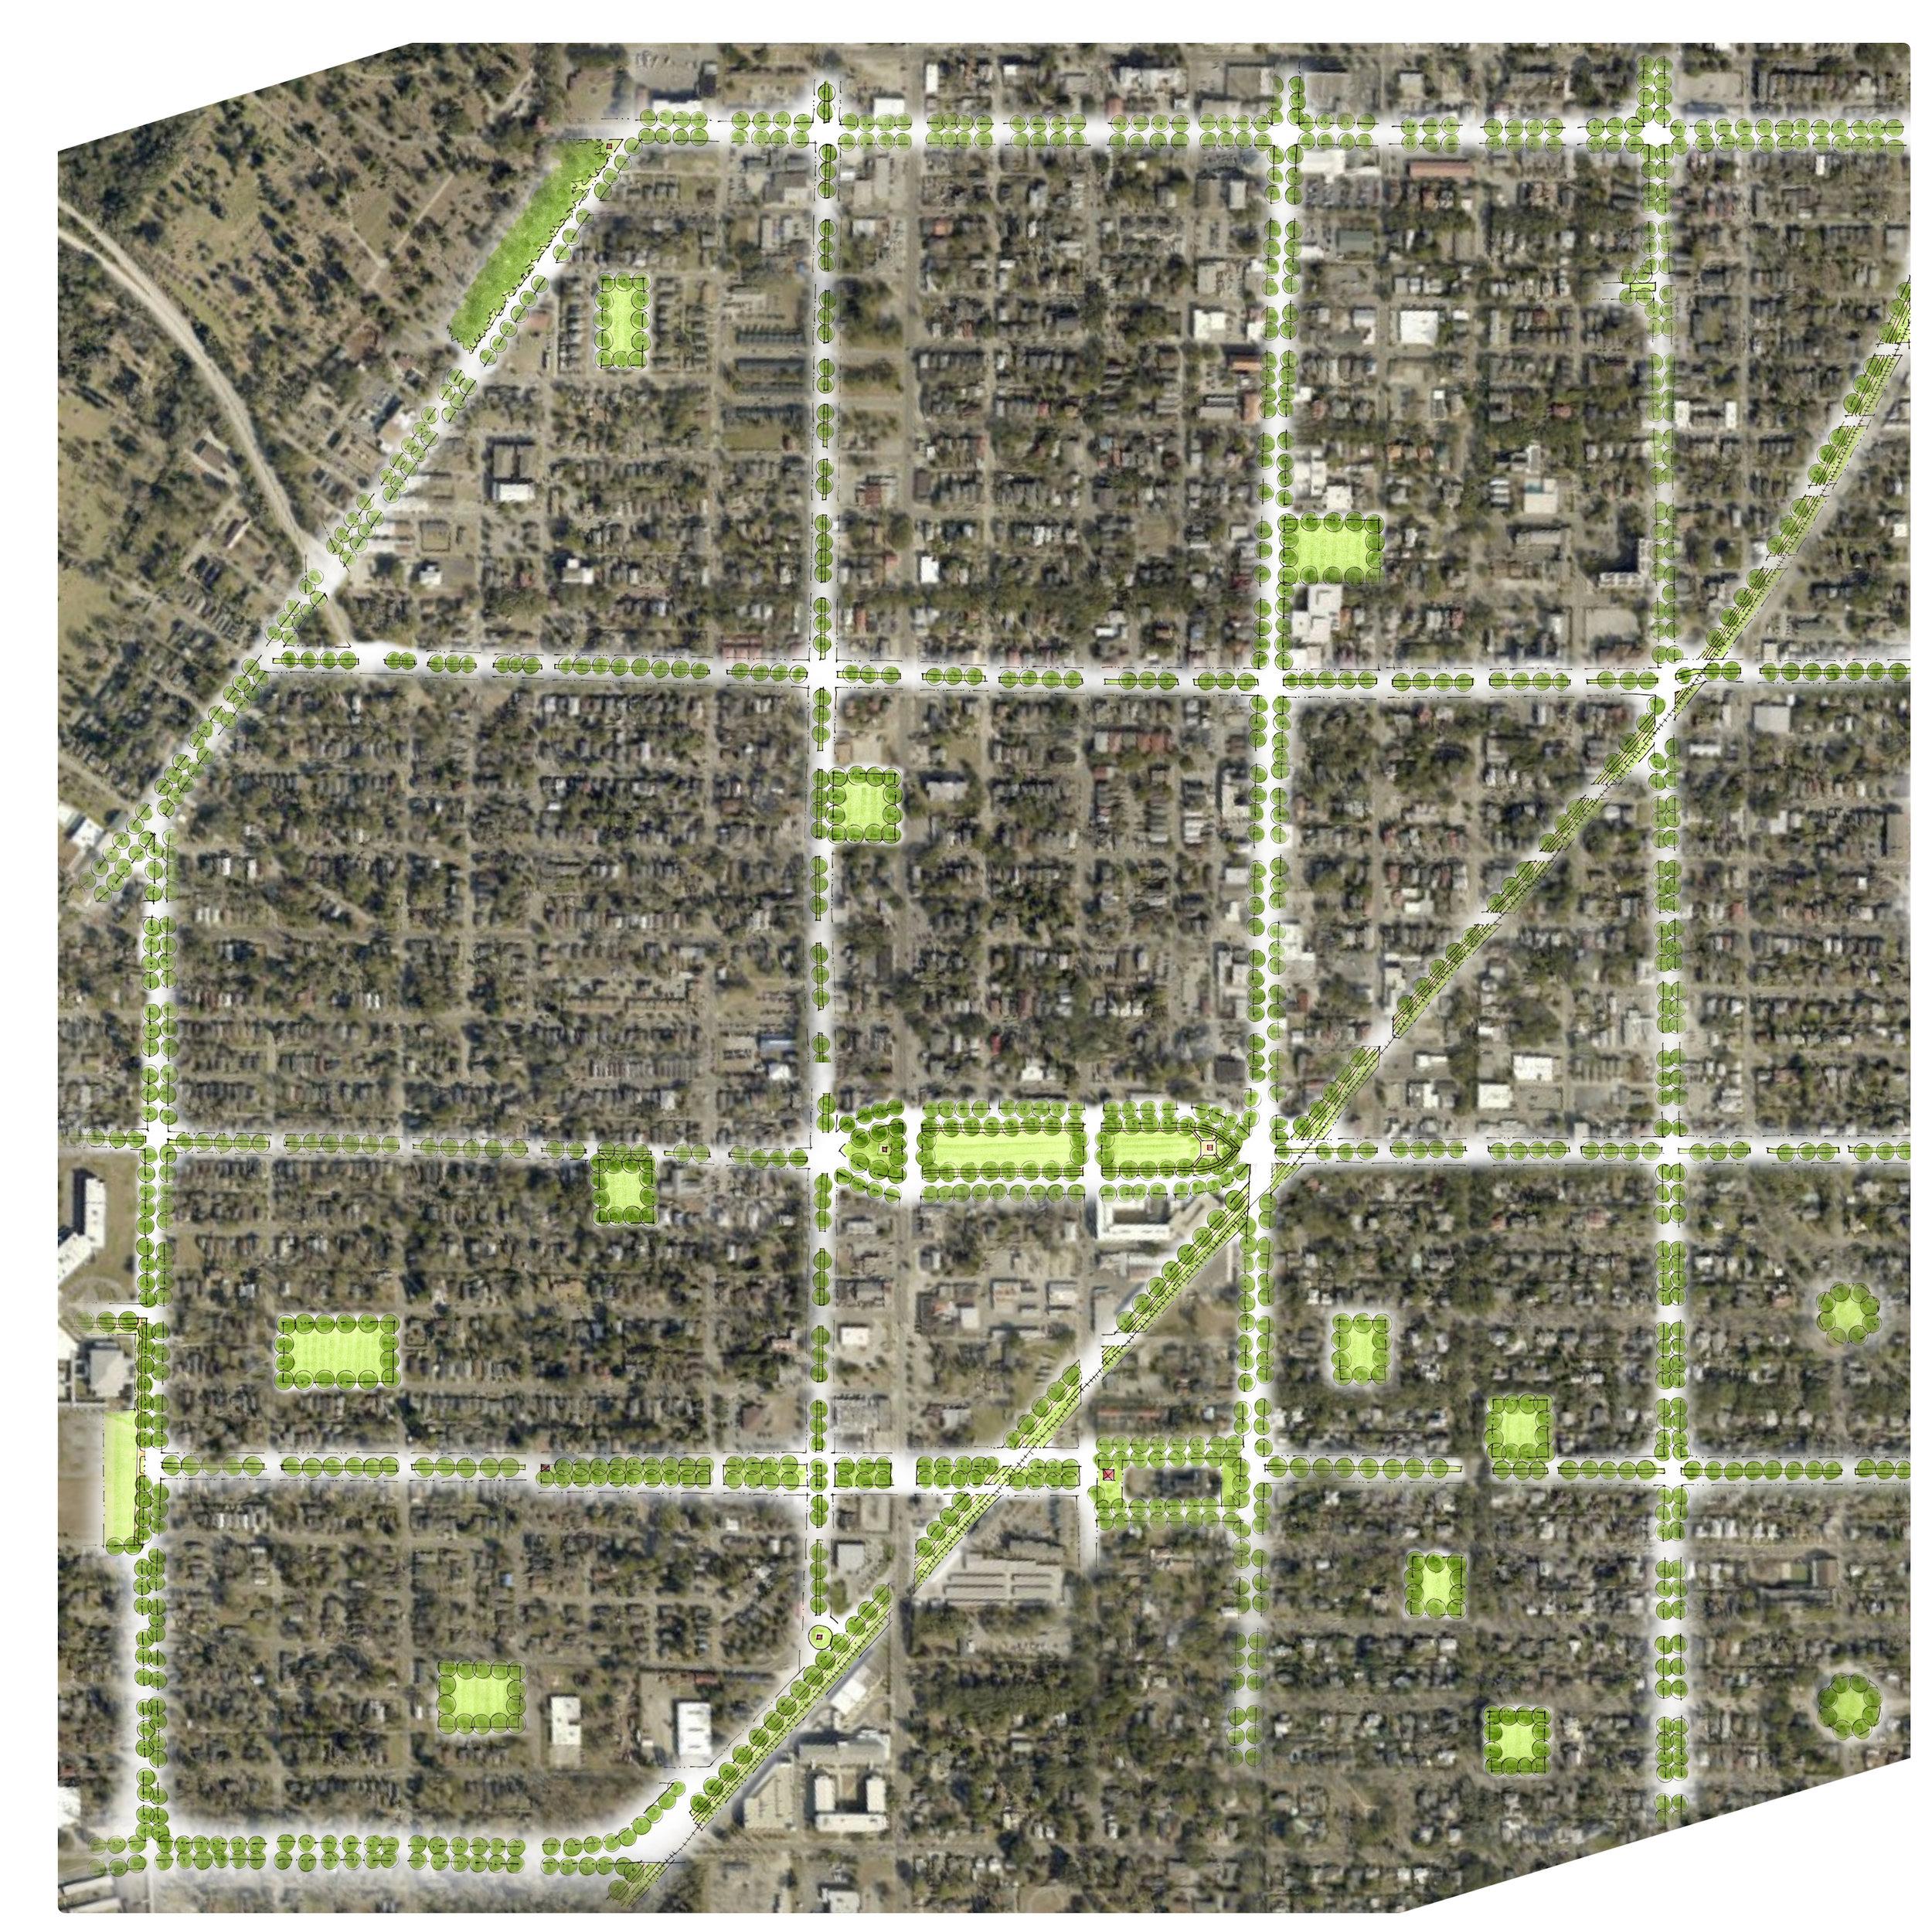 mid city north 1=200 180523 small.jpeg